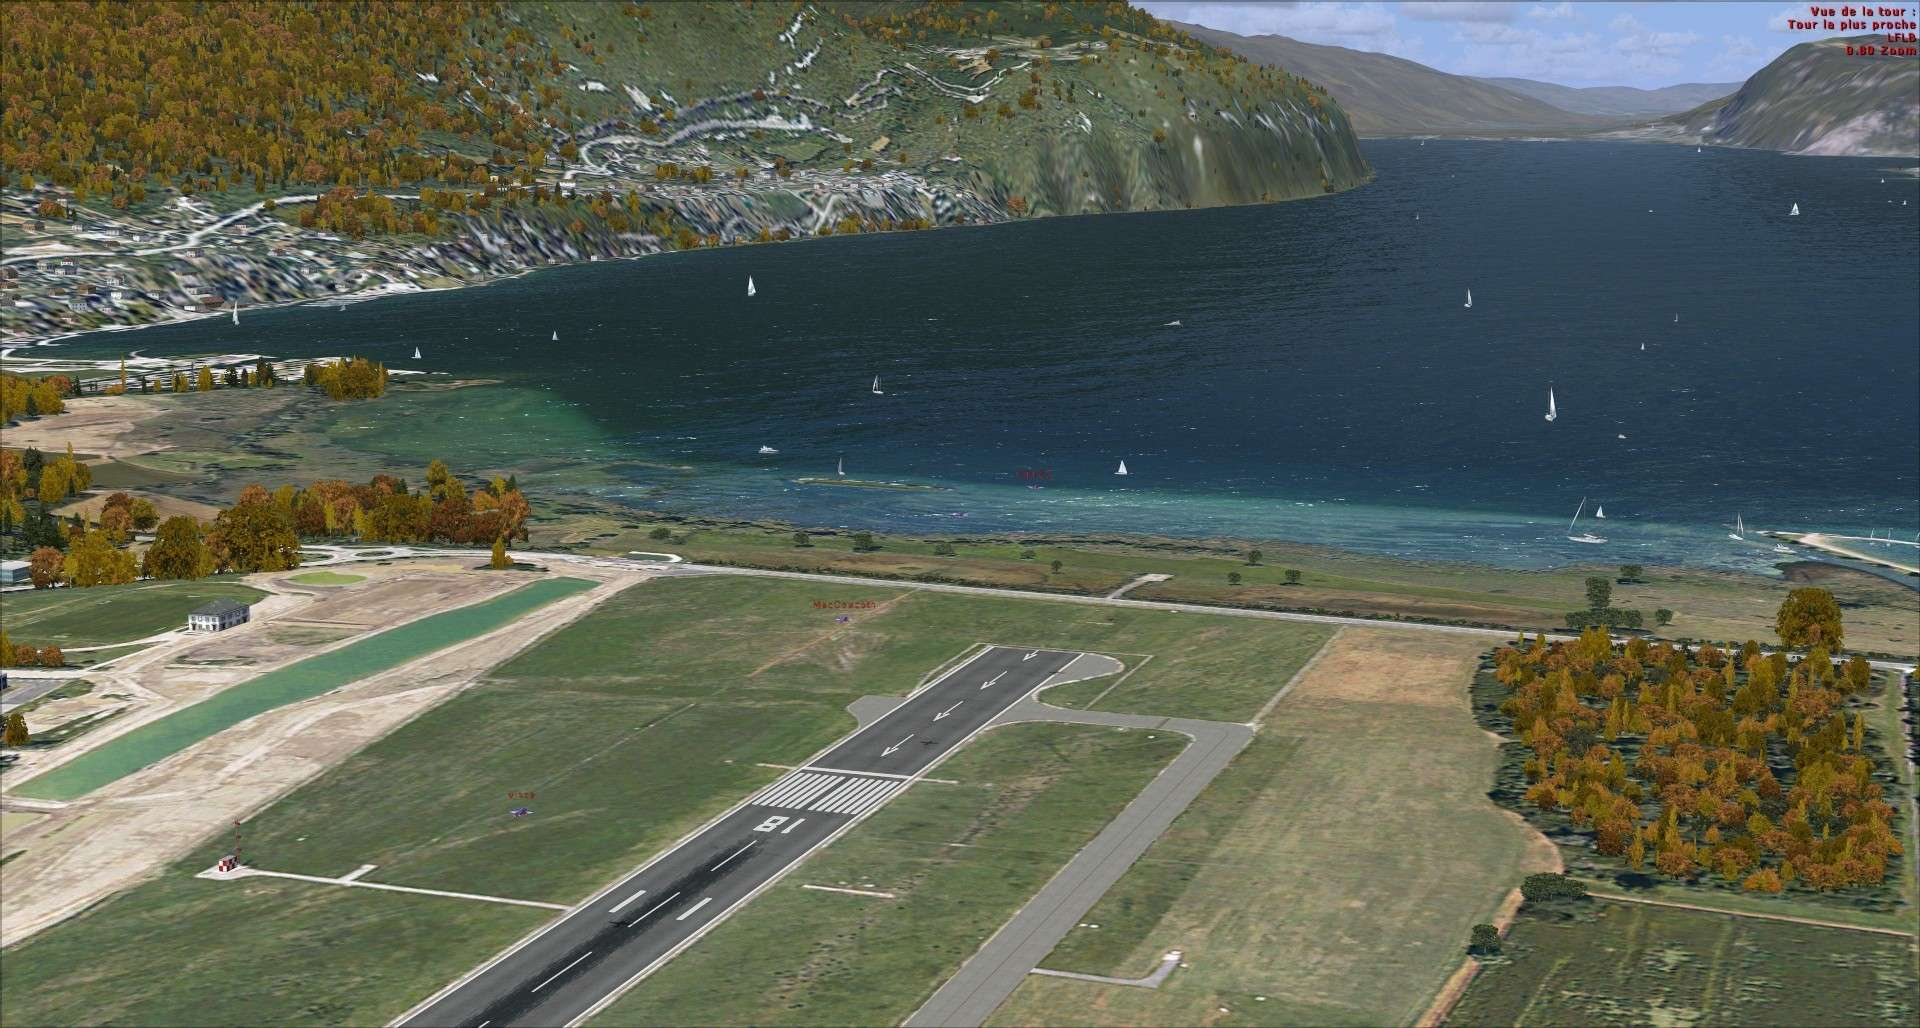 VOL FORMATION CAP10  vol en formation dans les Alpes 2014-911